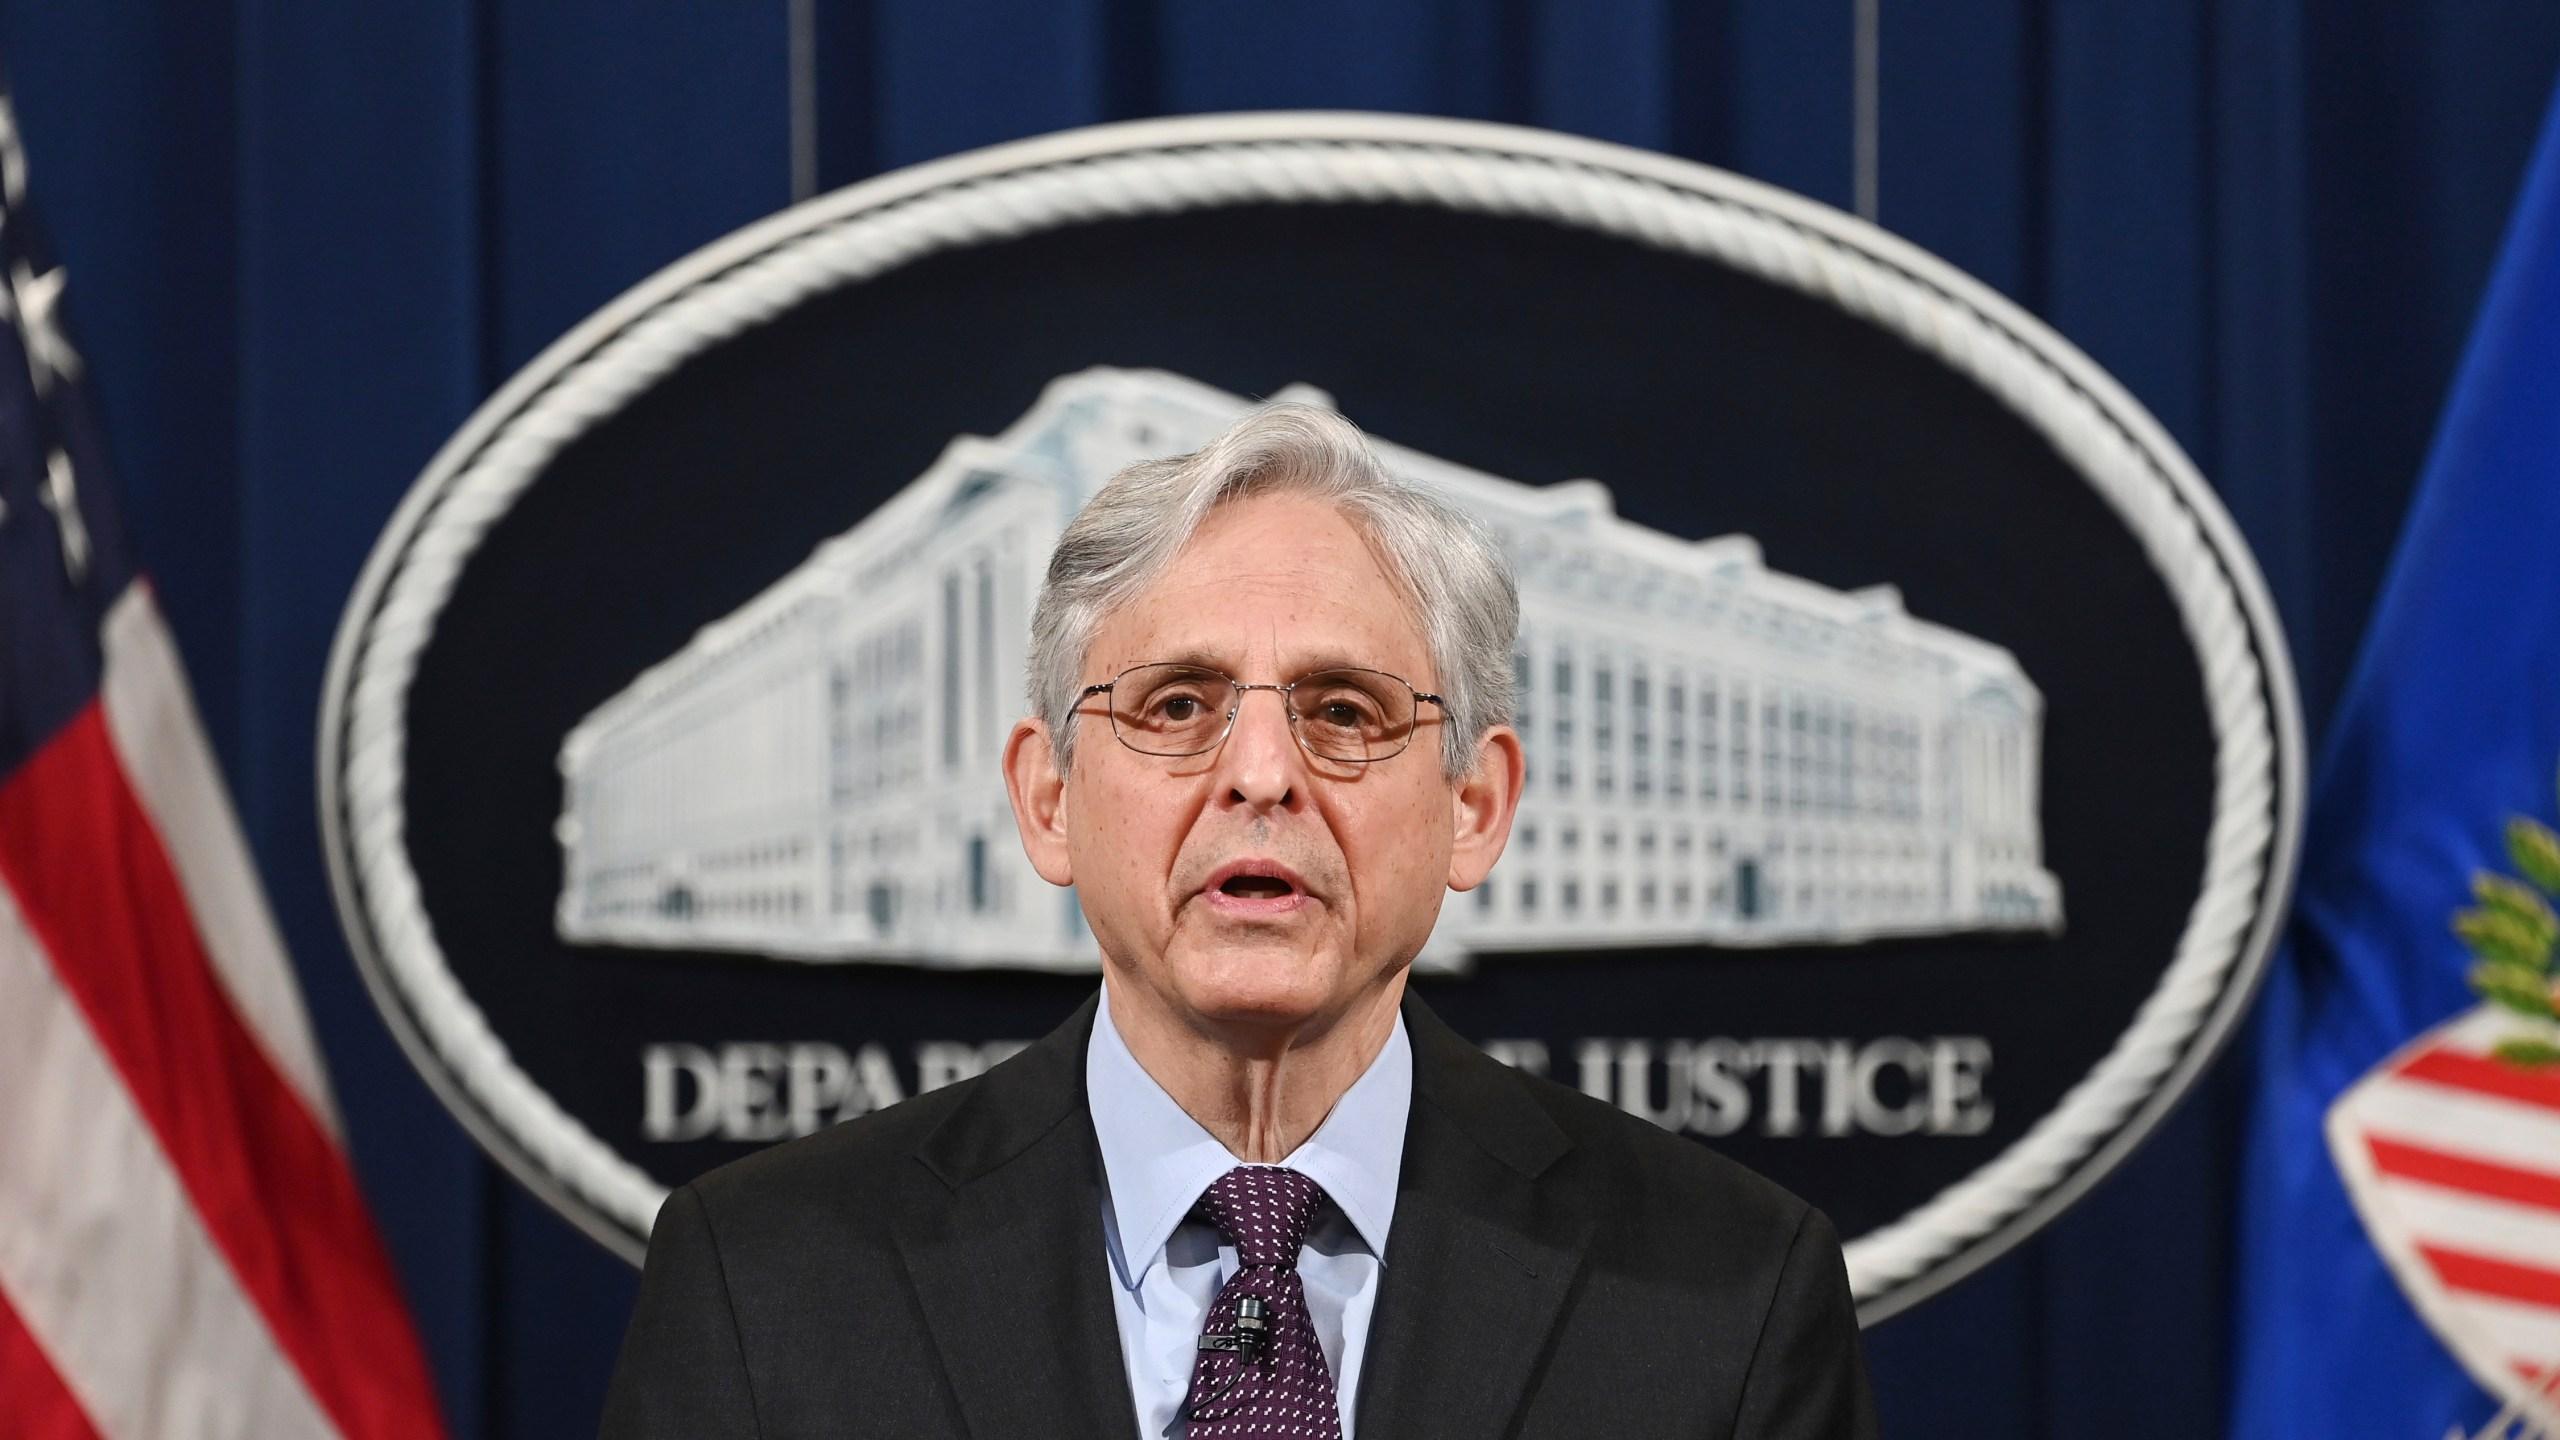 Attorney General Merrick Garland speaks at the Department of Justice in Washington, Monday, April 26, 2021. (Mandel Ngan/Pool via AP)